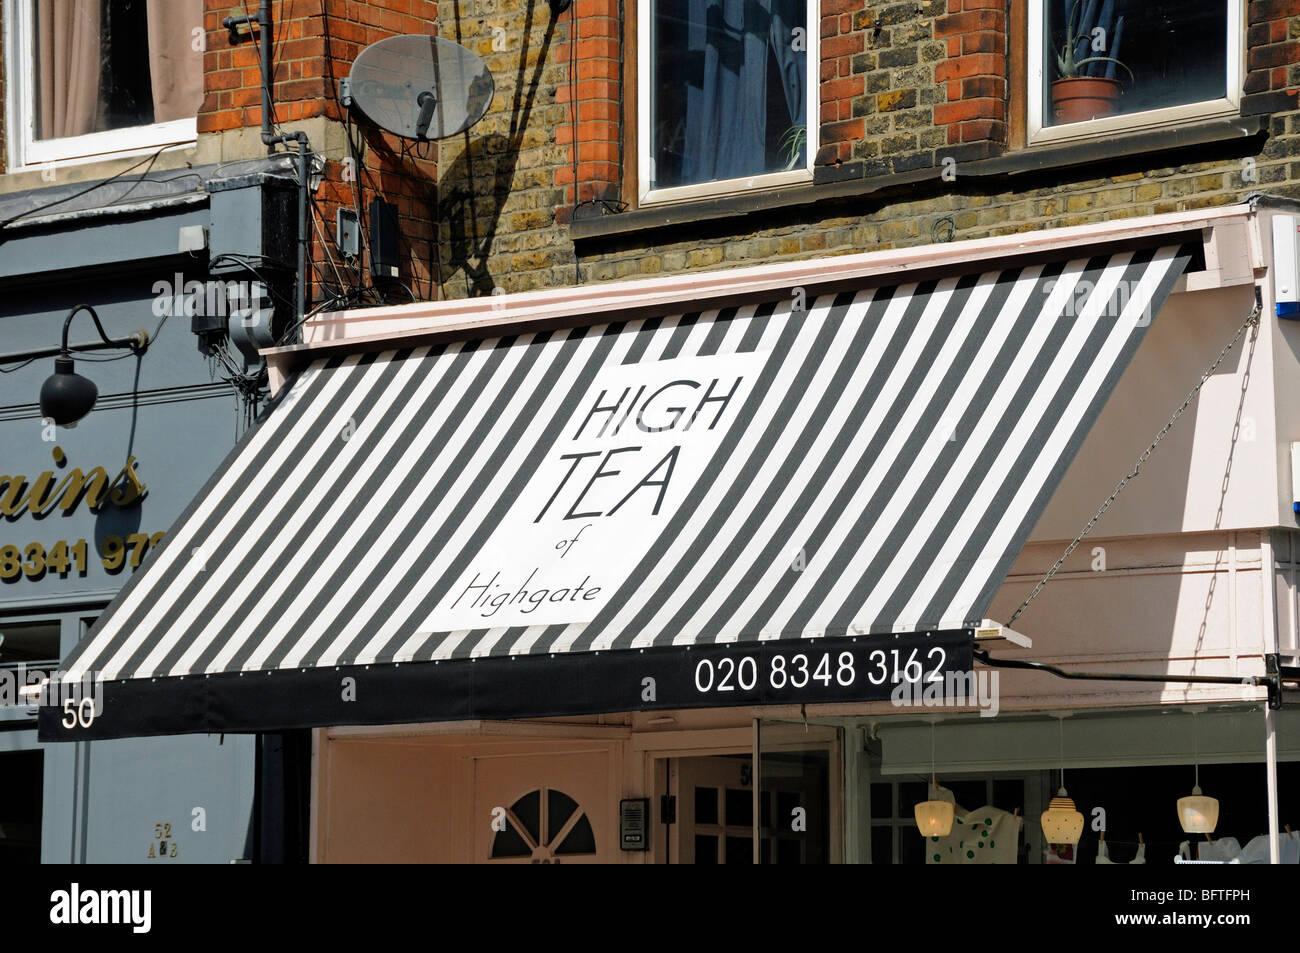 Awning Over High Tea Of Highgate Cafe In Village London England UK